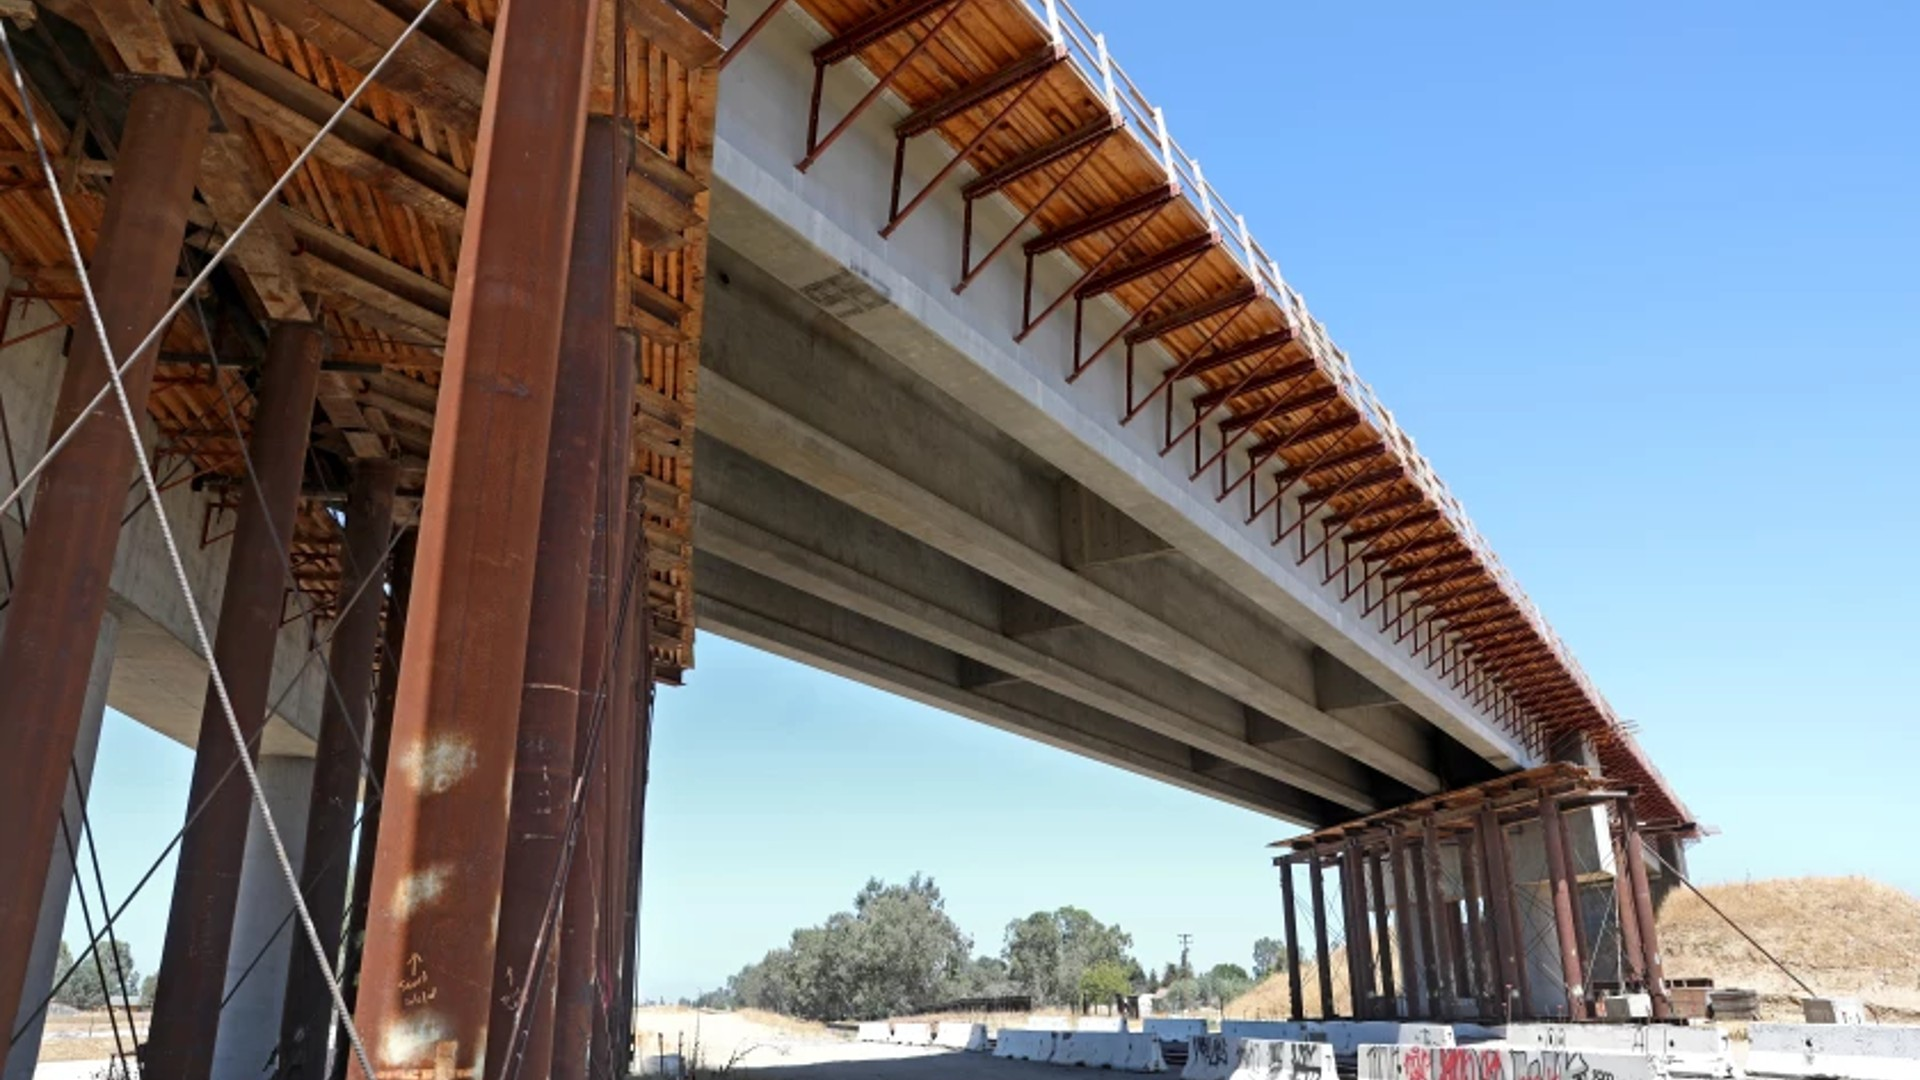 A 700-foot-long bridge in Madera under construction for the California bullet train.(Gary Coronado / Los Angeles Times)